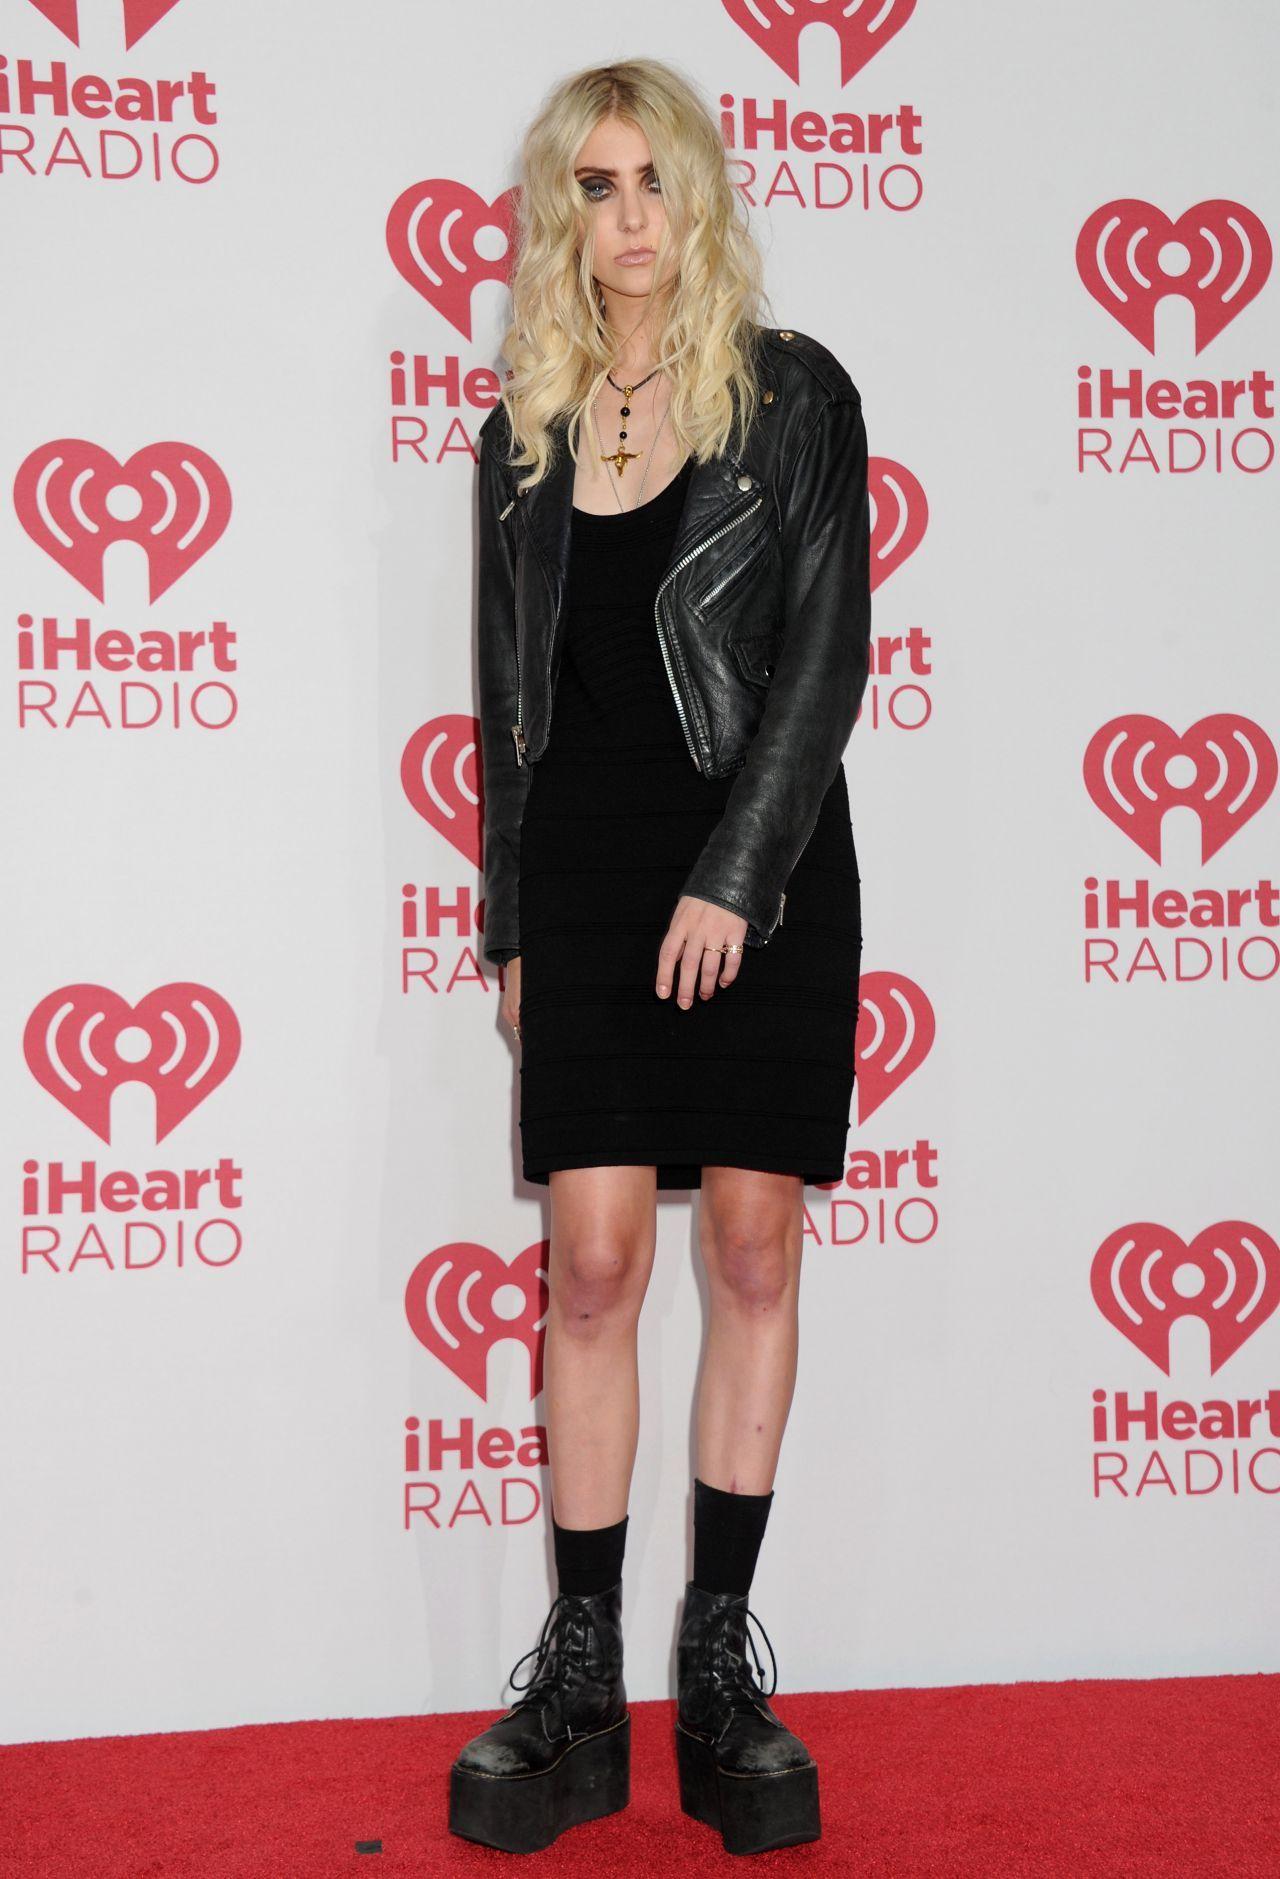 iheart radio awards 2015 fashion | Taylor Momsen – 2014 iHeartRadio Music Festival in Las Vegas